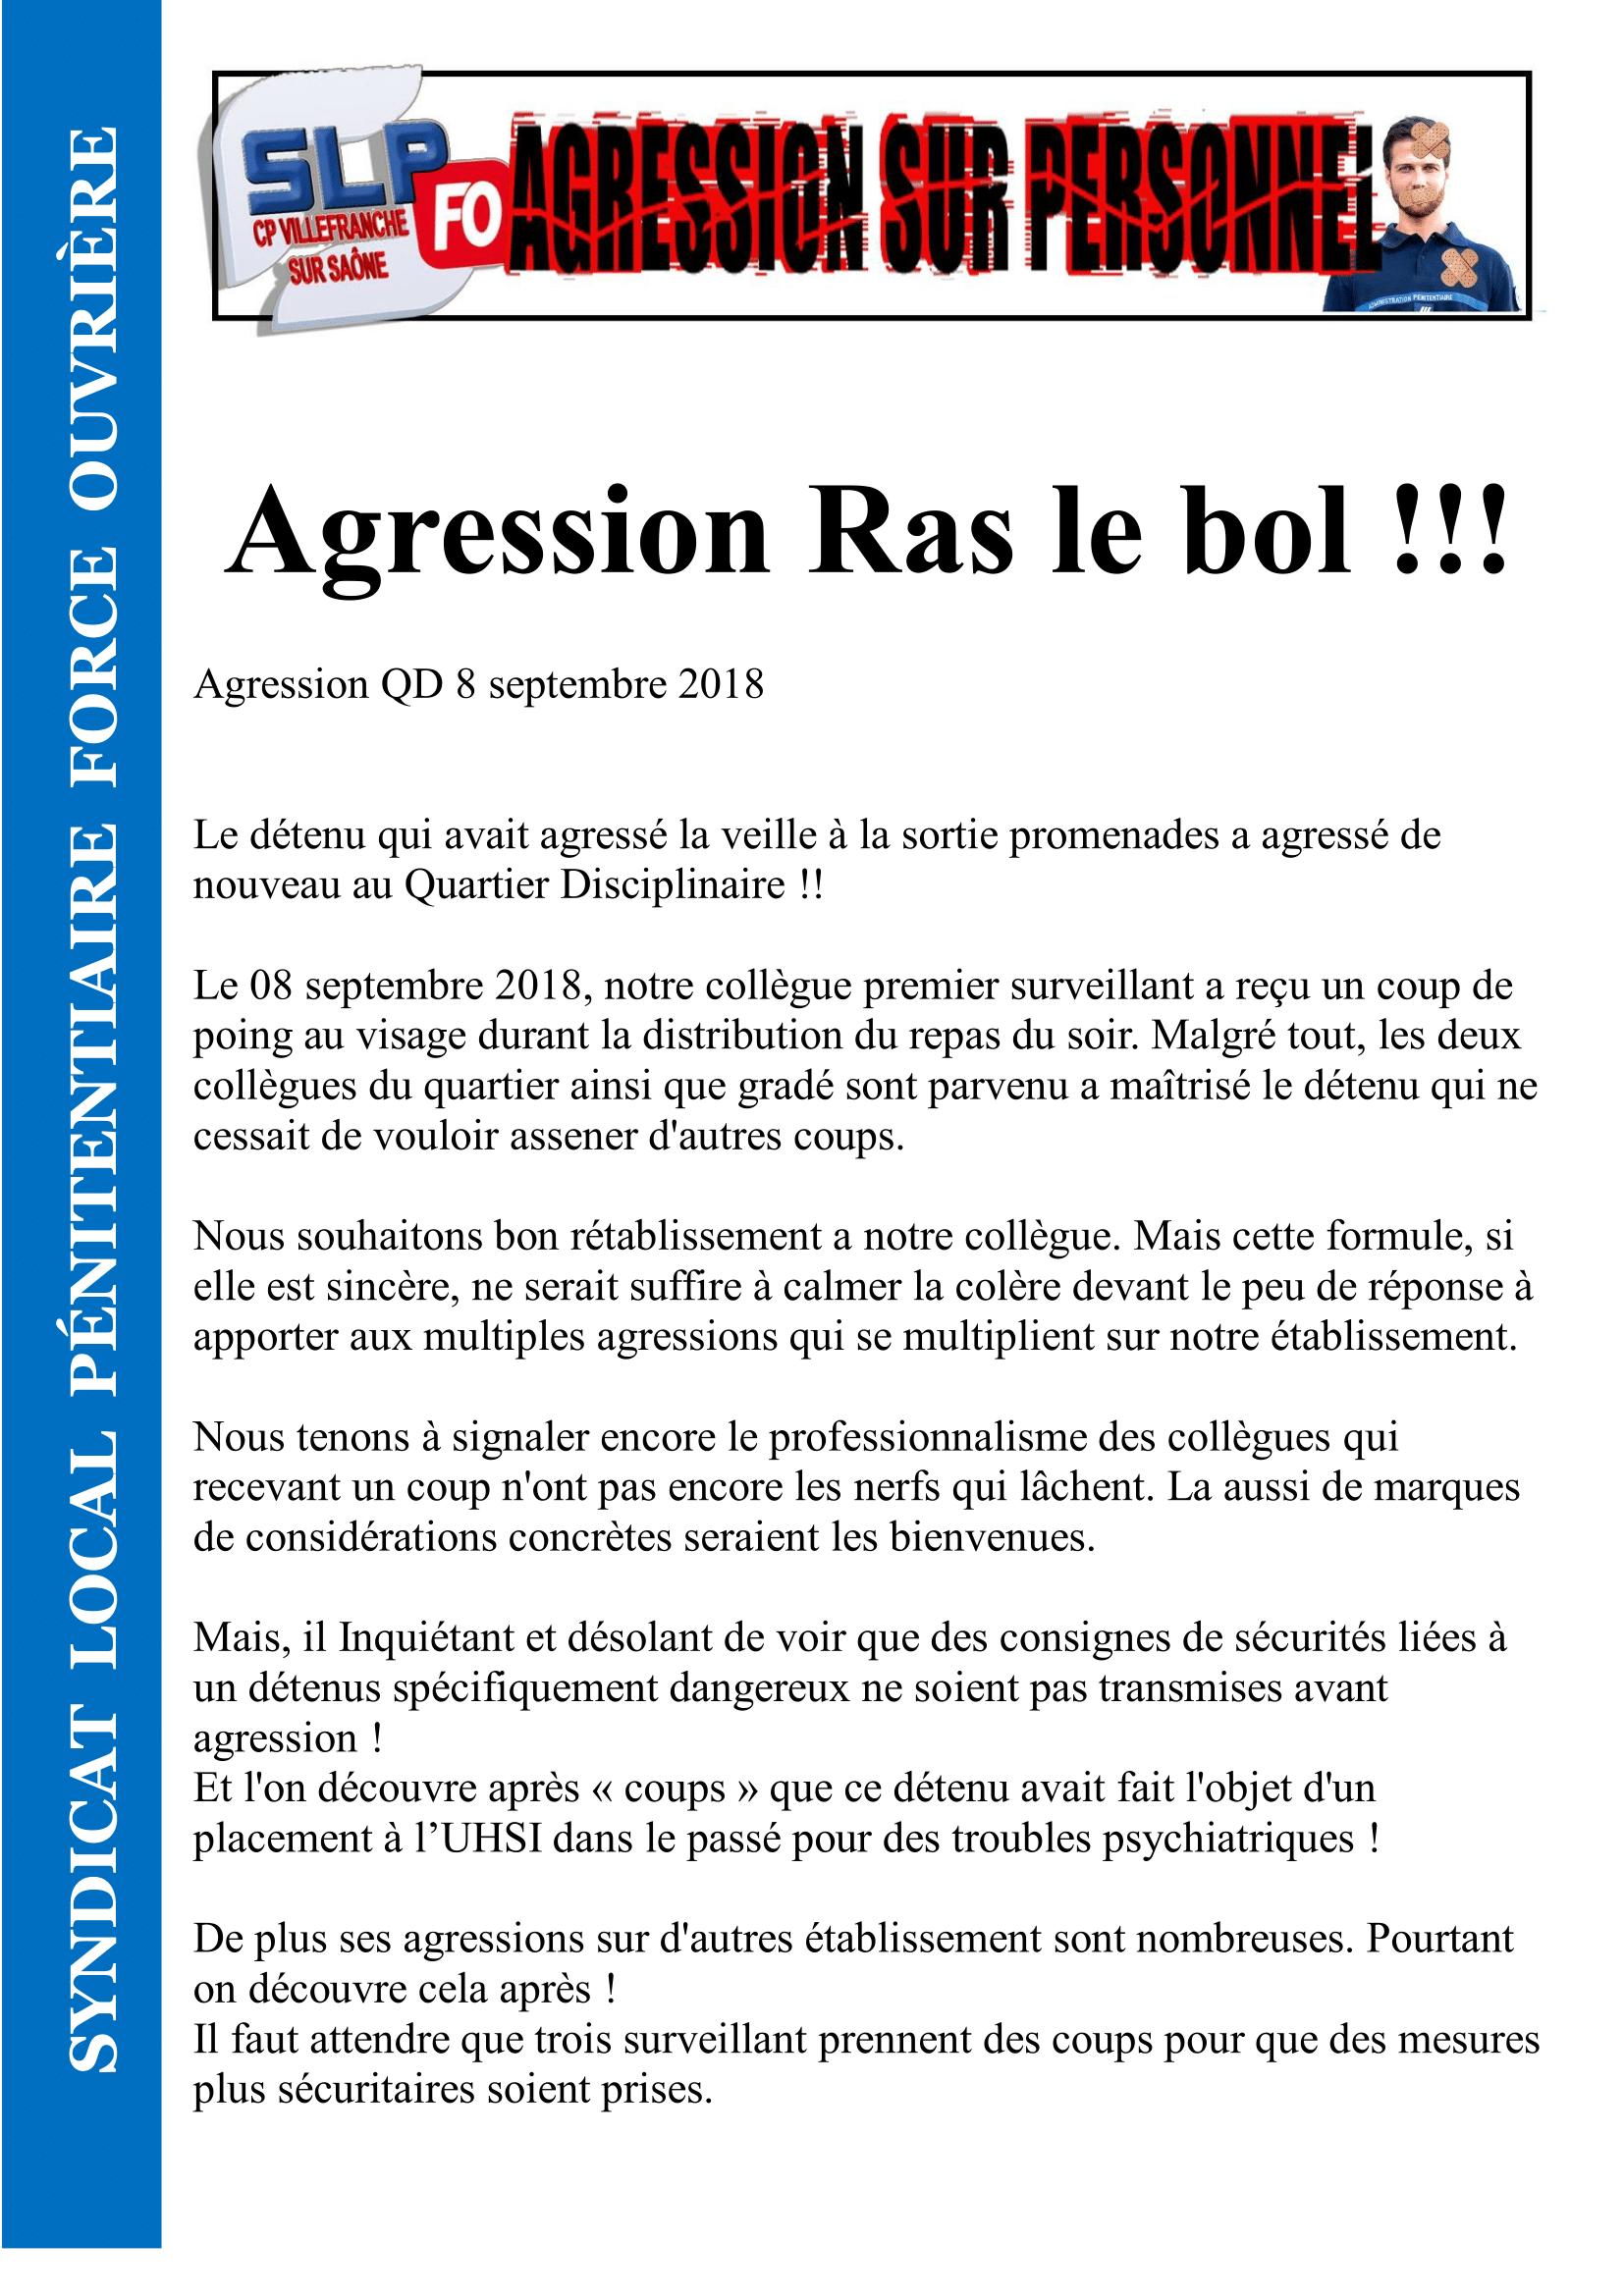 Agression QD 8 septembre 2018-1